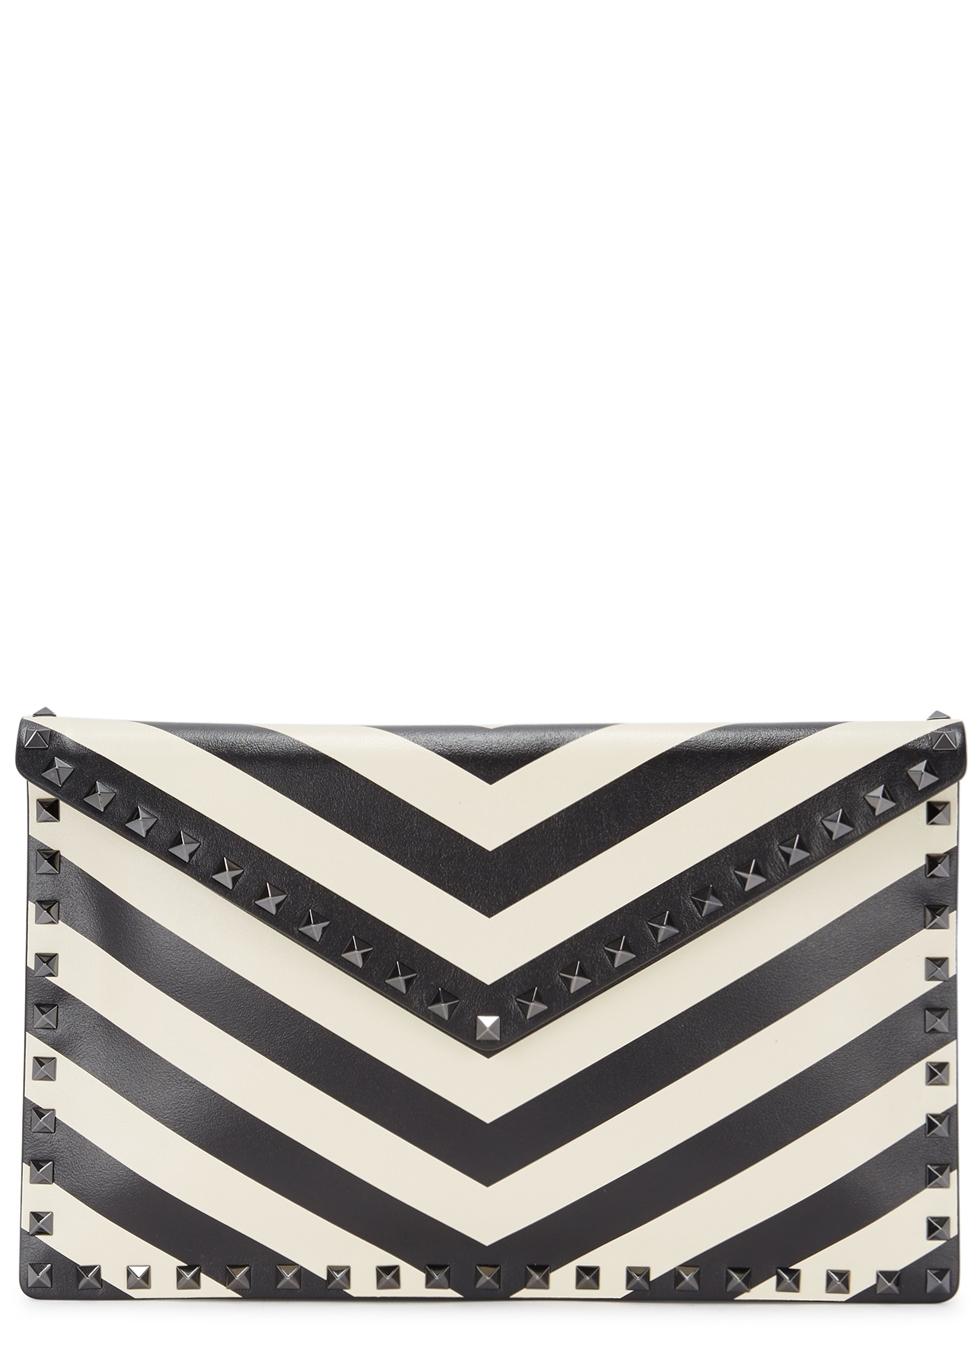 Black And White Rockstud Stripe Leather Envelope Clutch Bag